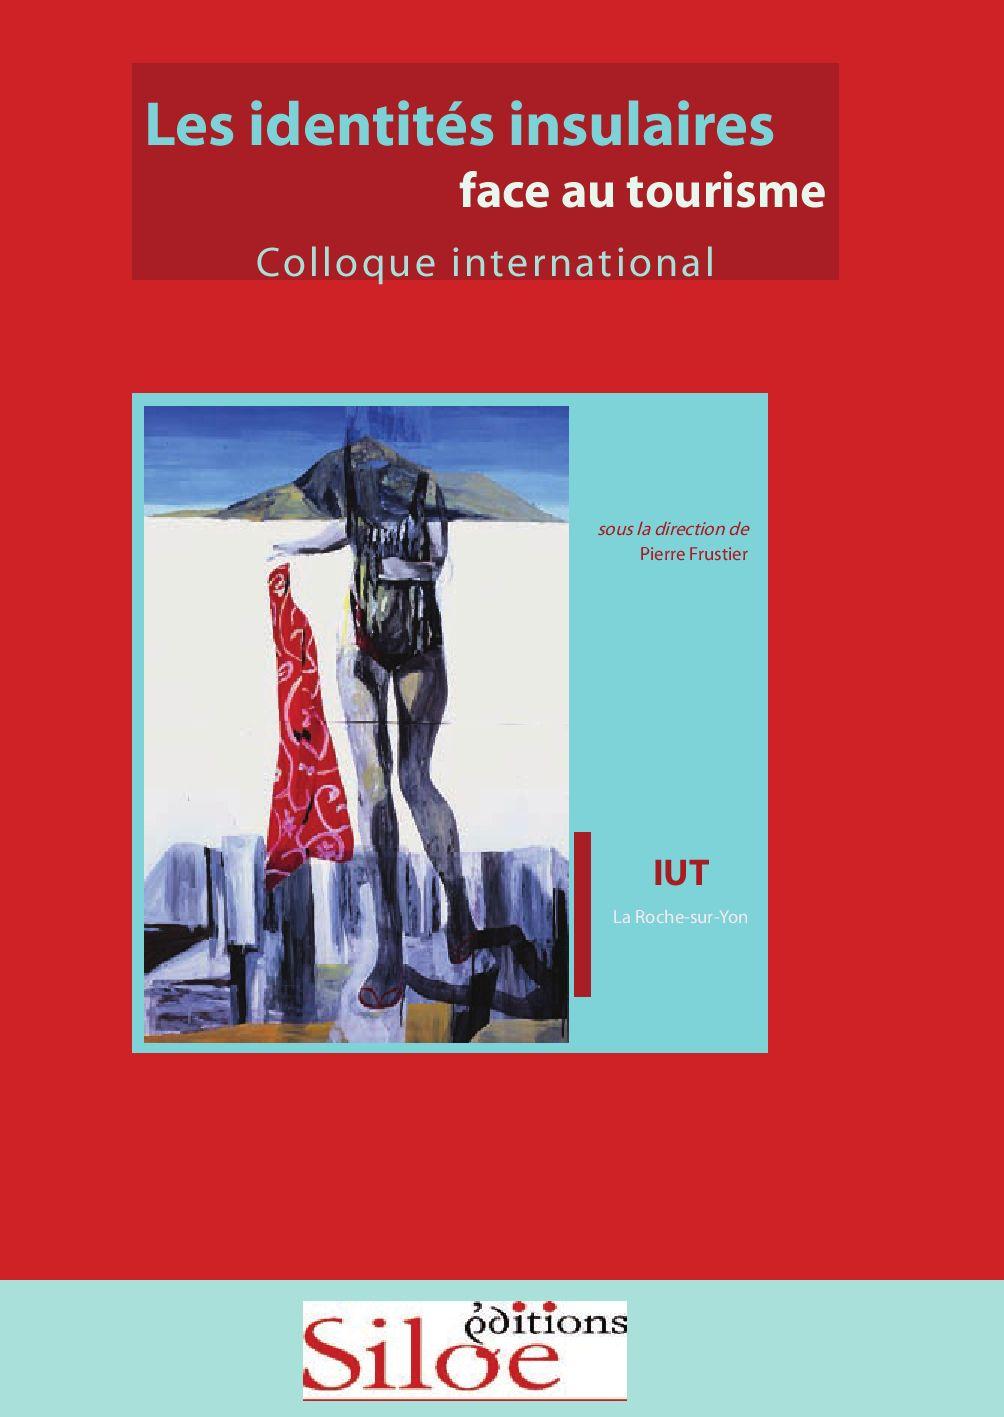 Colloque identités insulaires by olivierertzscheid - issuu 4d99d2a1d2f